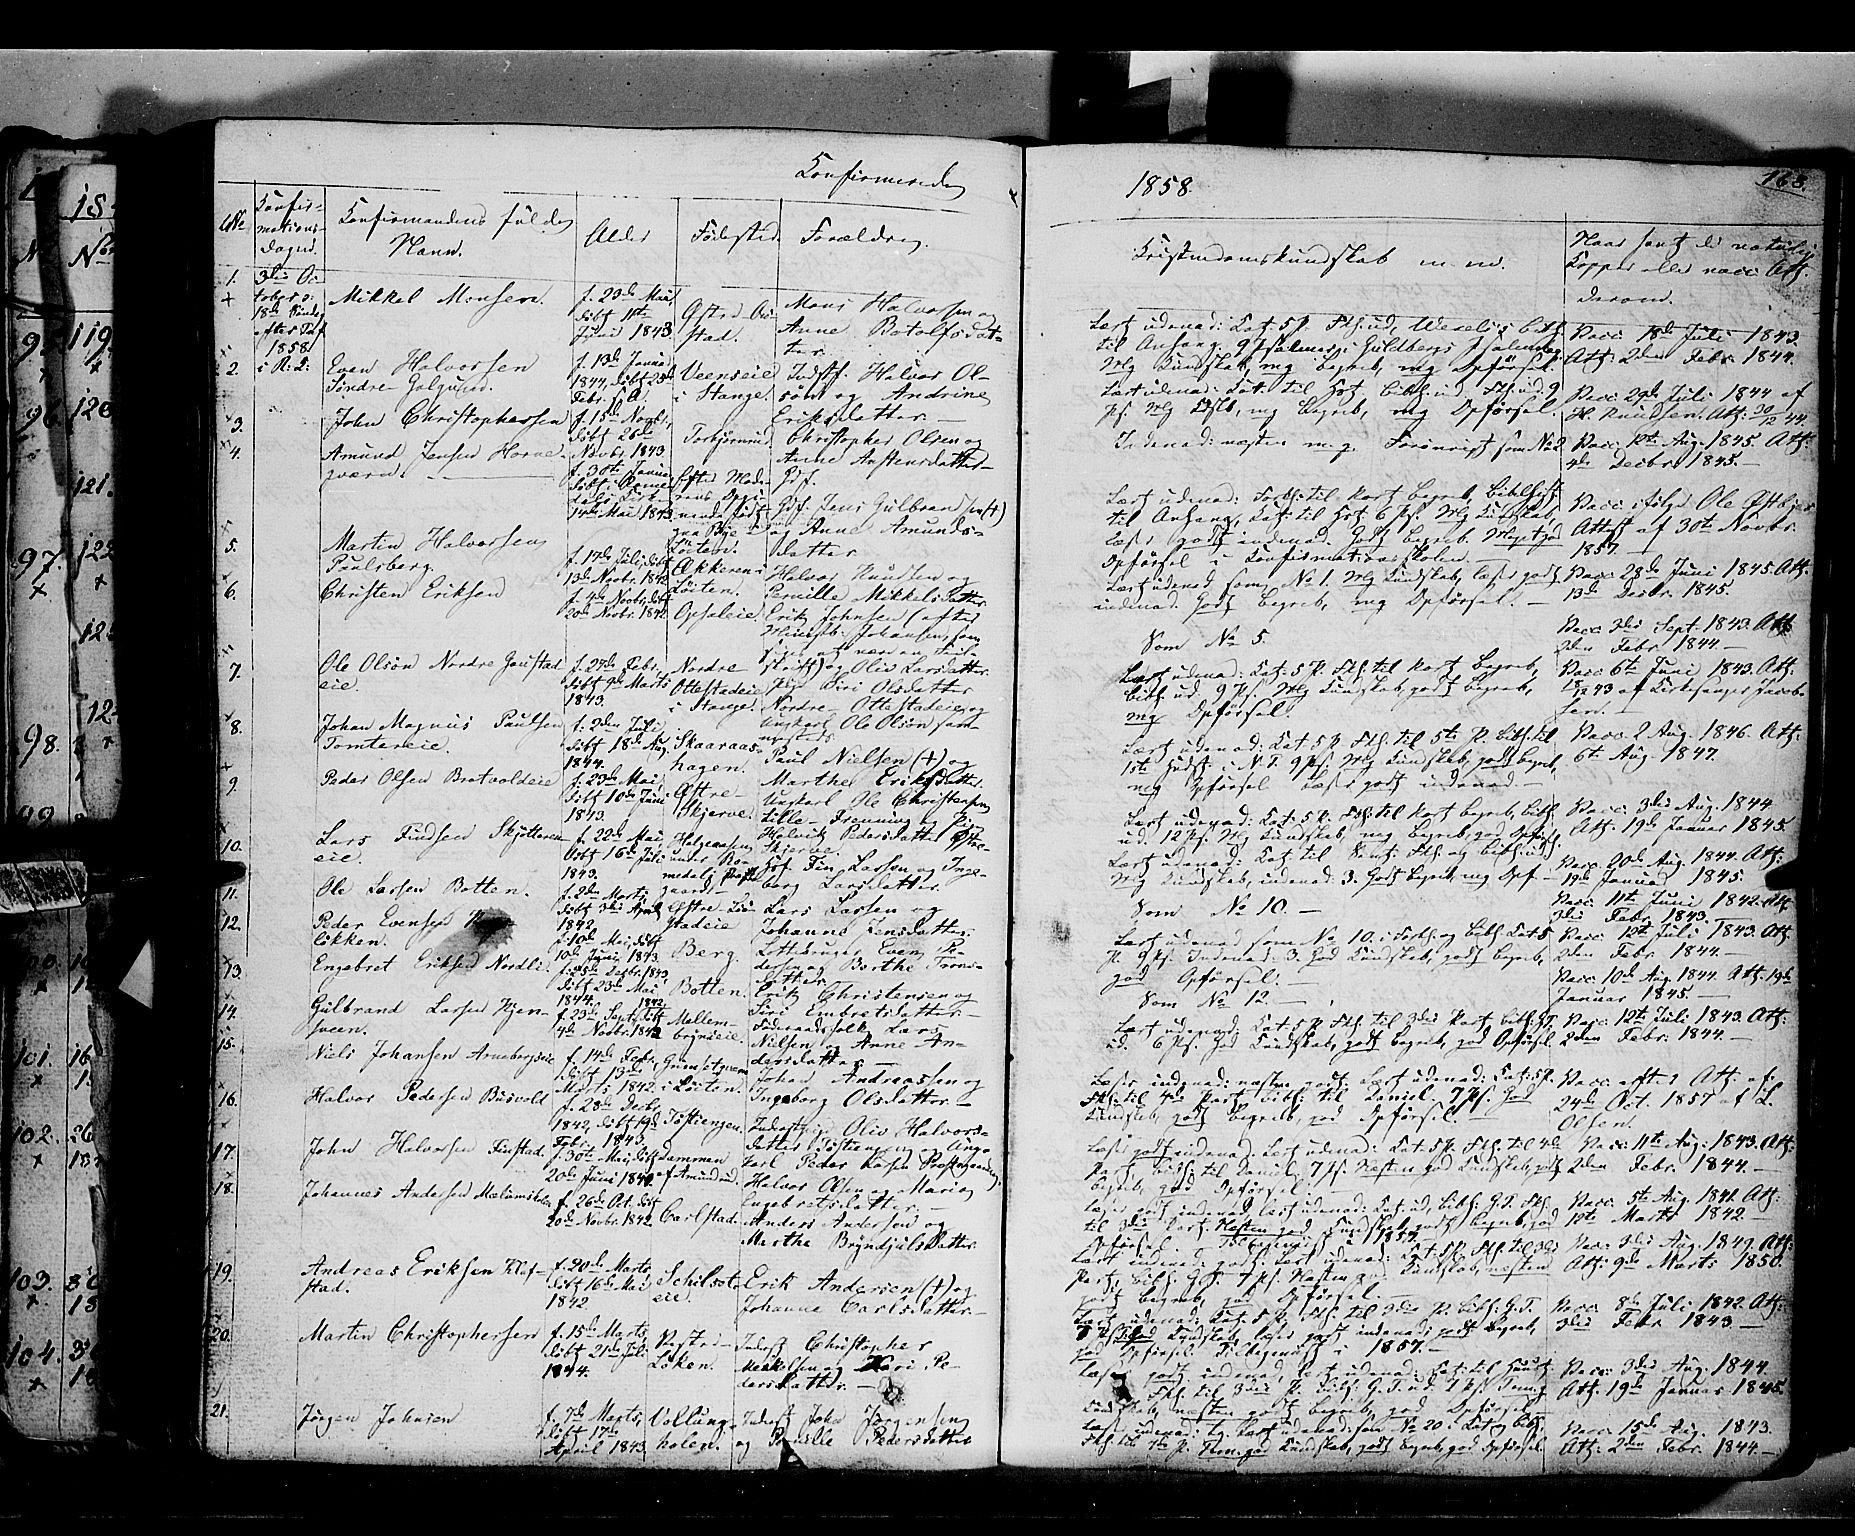 SAH, Romedal prestekontor, K/L0004: Ministerialbok nr. 4, 1847-1861, s. 168